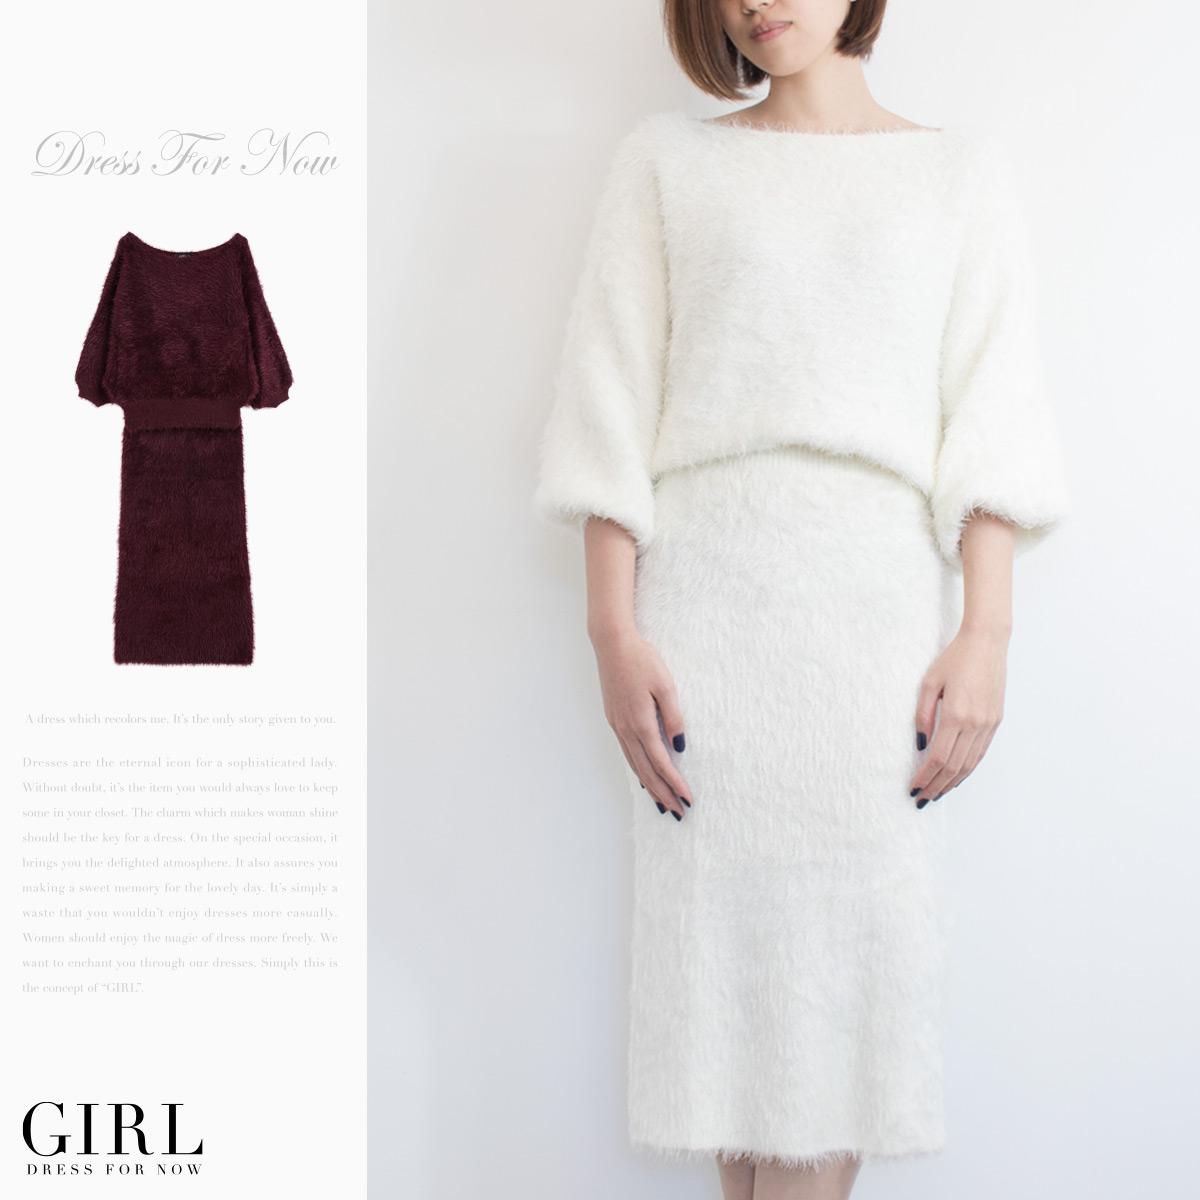 Dress shop GIRL | Rakuten Global Market: Tight tight skirt long knee ...